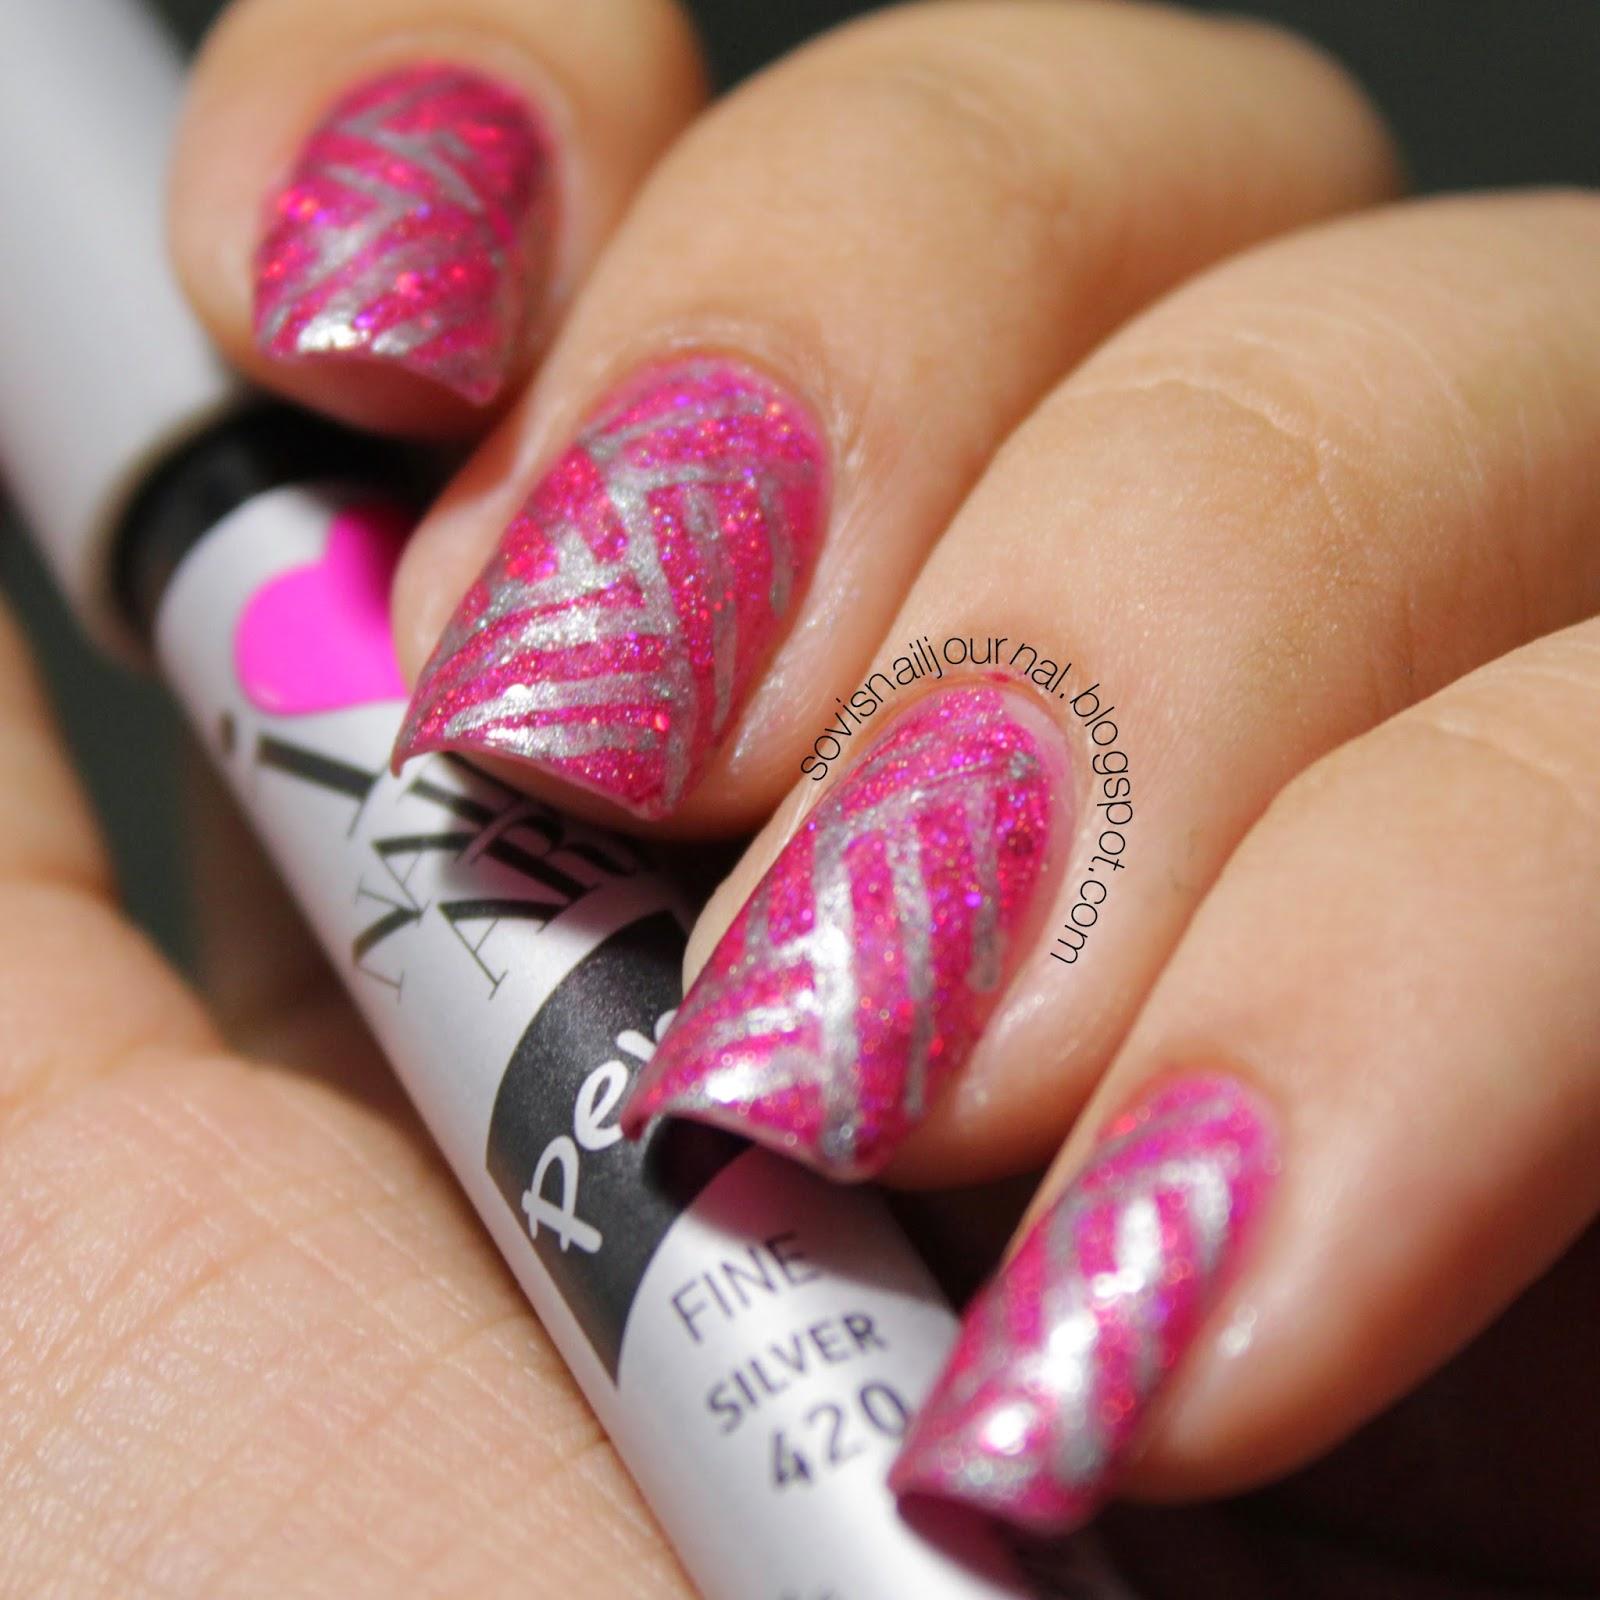 Sovis Nail Journal Sally Hansen I Heart Nail Art Stylo Nail Art